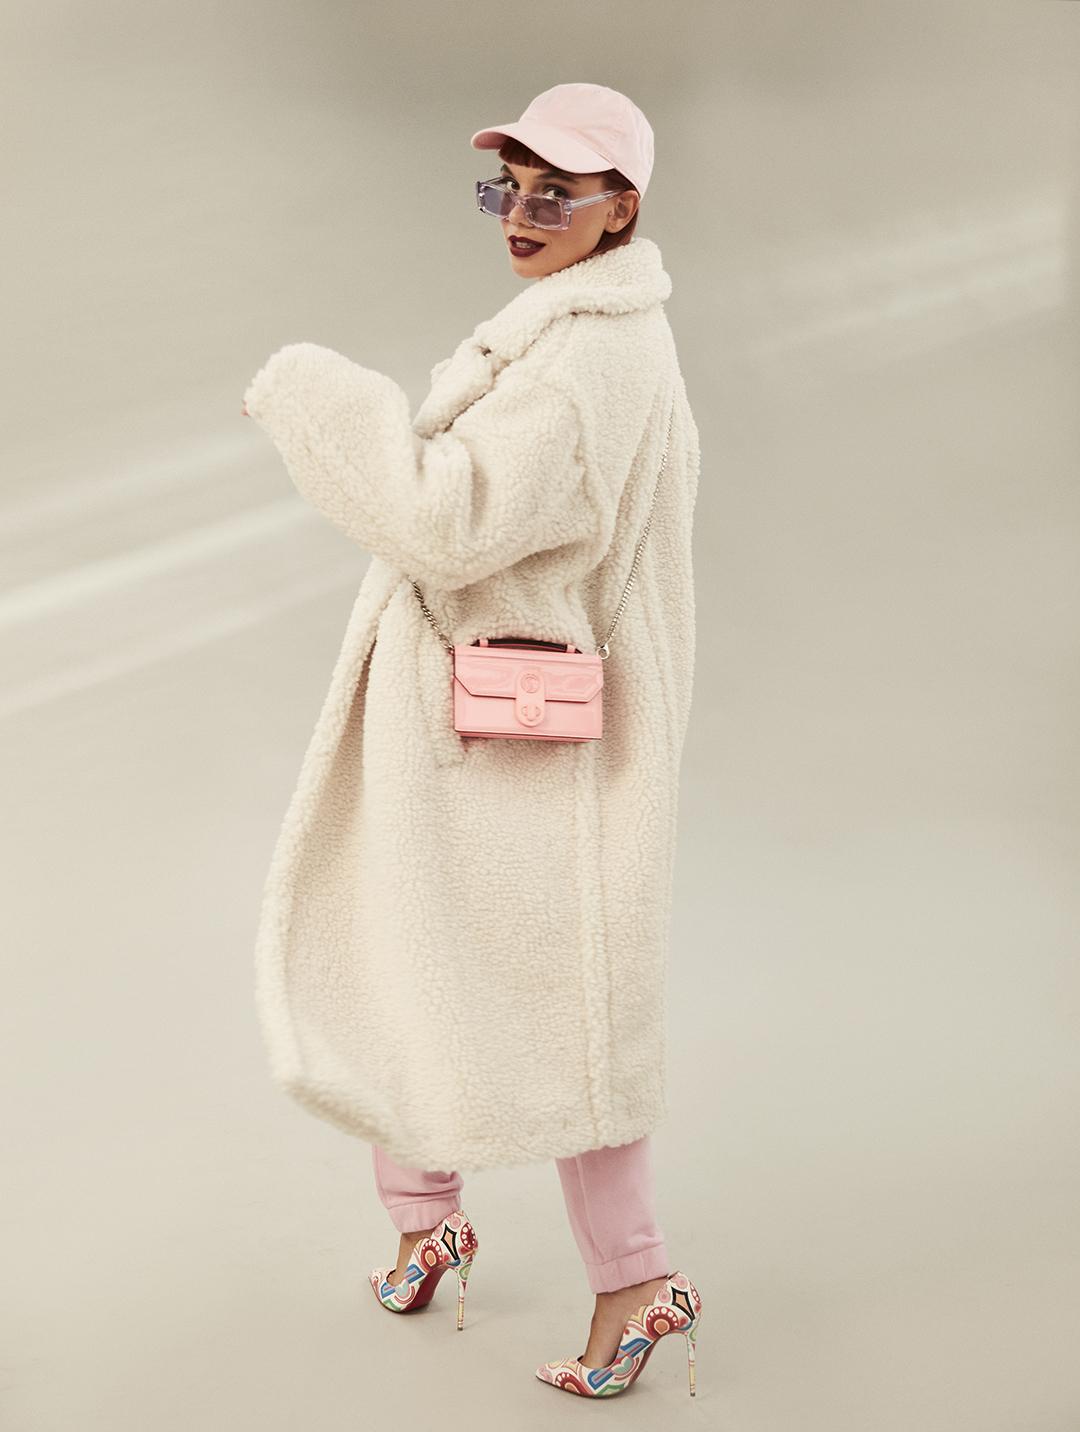 Martina Cariddi - Neo2 Magazine - Fashion - Editorial - Interview - Magazine - Rafa Gallar - Actress - 8AM - 8 Artist Management